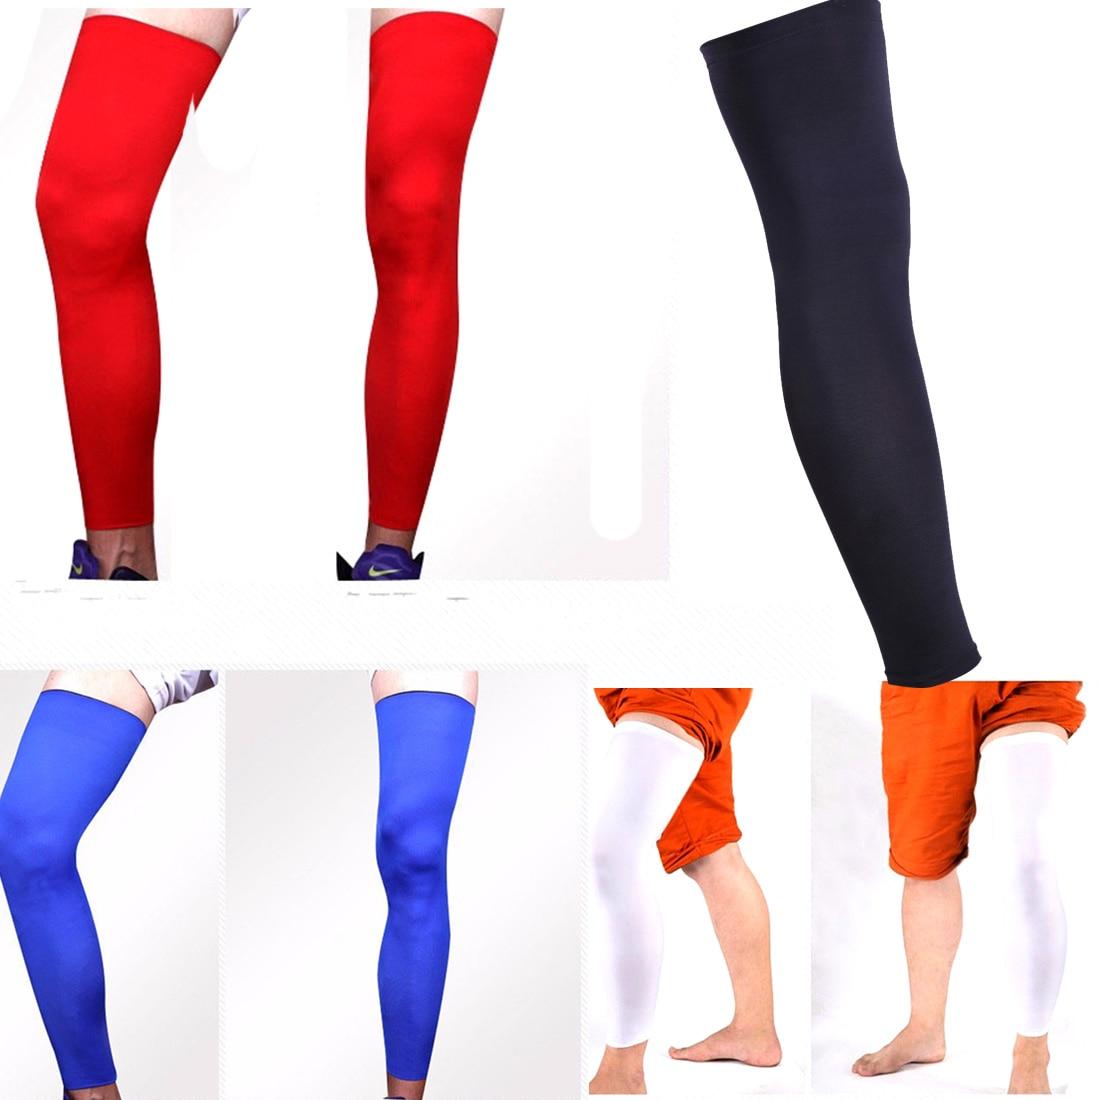 Good Quality Knitted Basketball Cycling Men Women Leg Warmers Elastic Stretch High Socks Skinny Stockings Sports Leg Sleeve